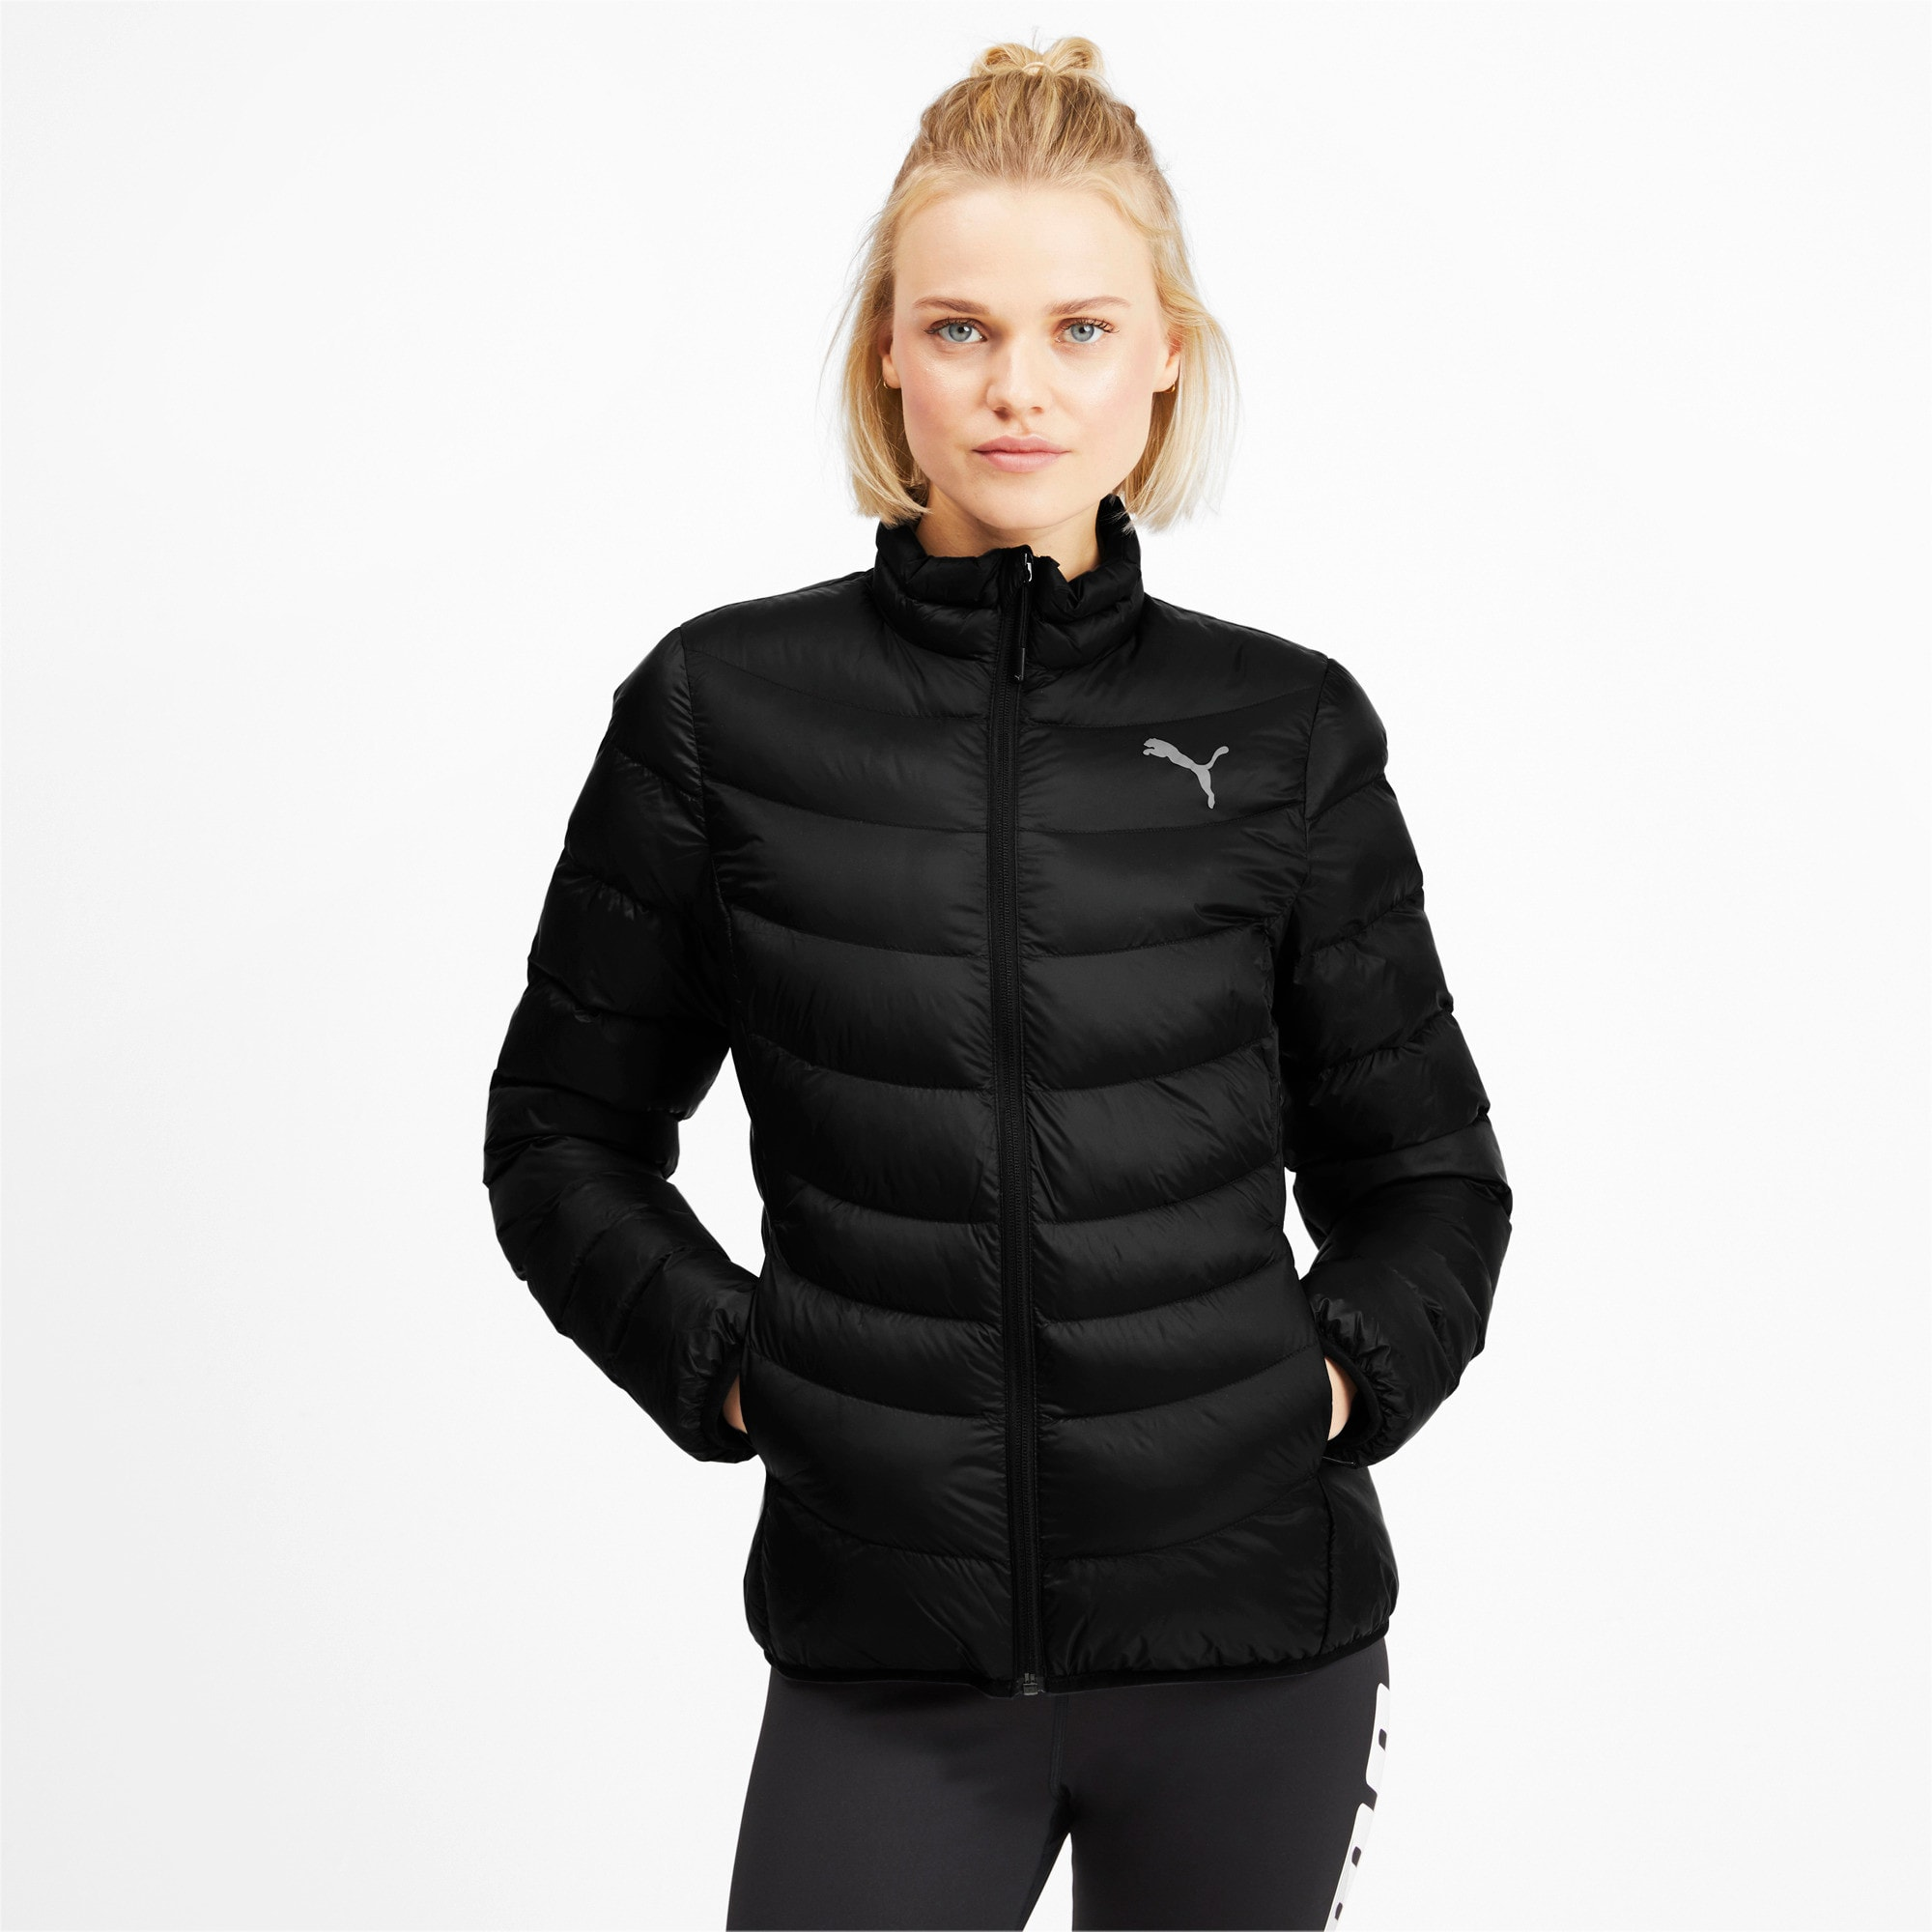 Thumbnail 1 of Ultralight warmCELL Women's Jacket, Puma Black, medium